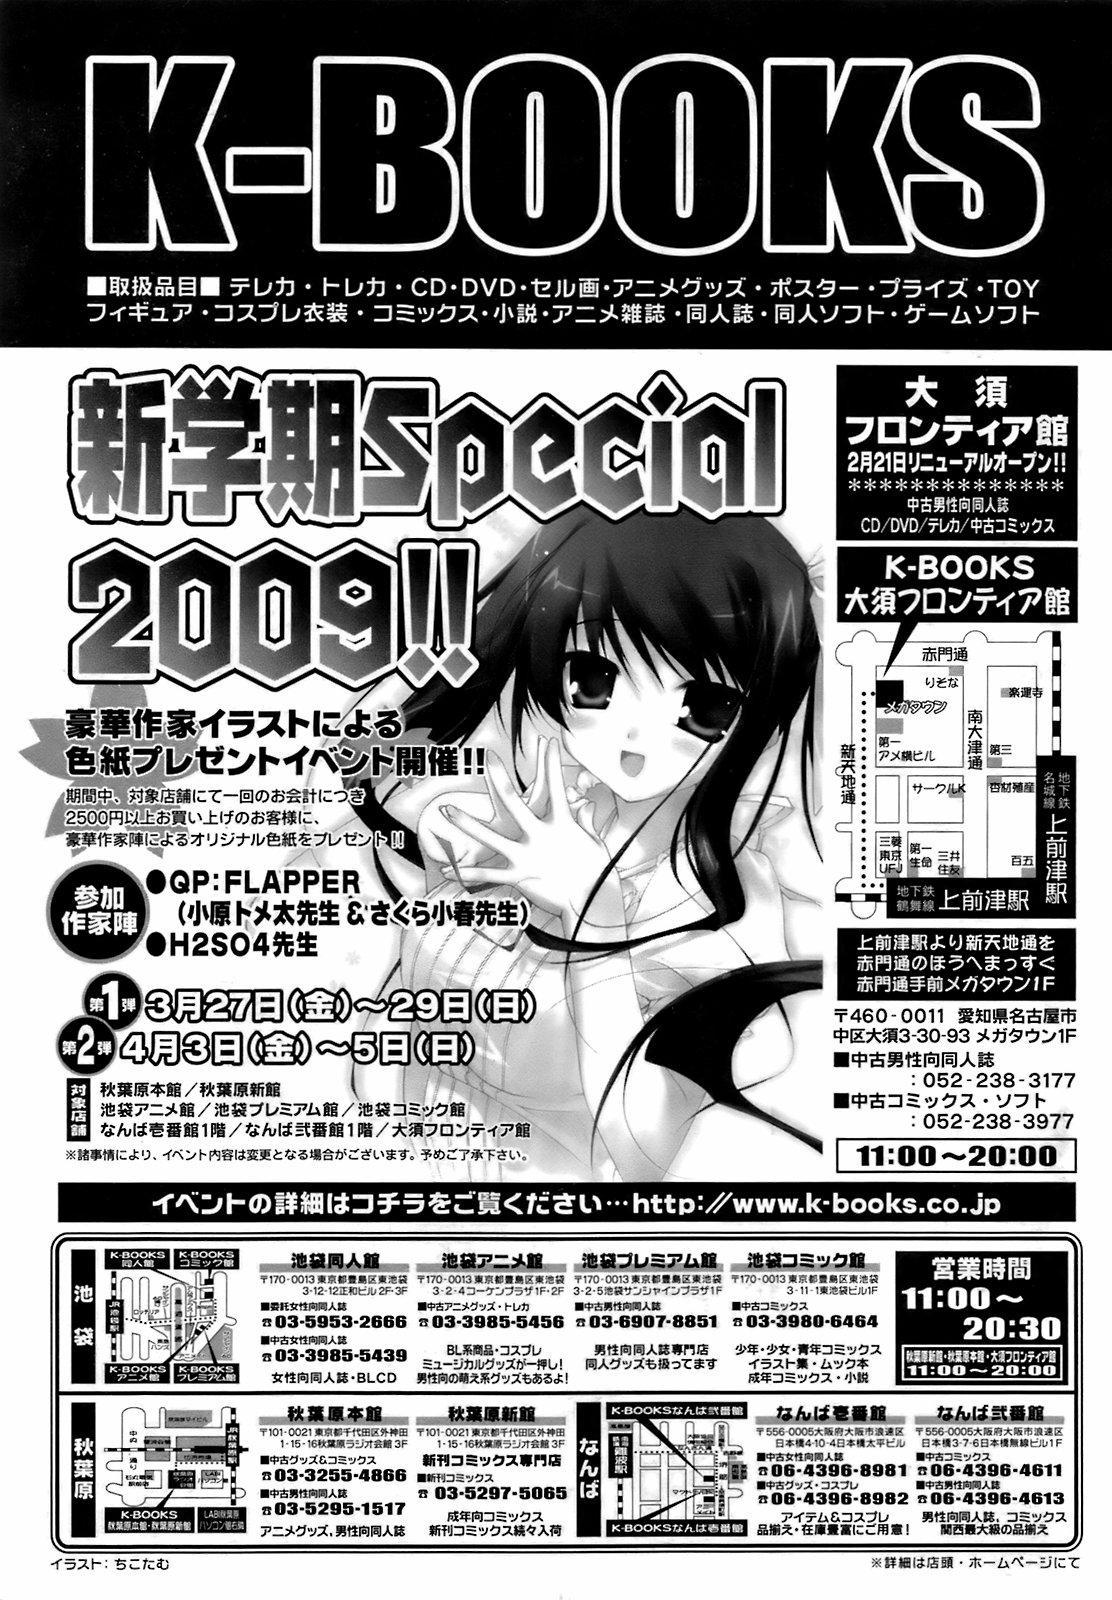 COMIC Megastore 2009-04 63